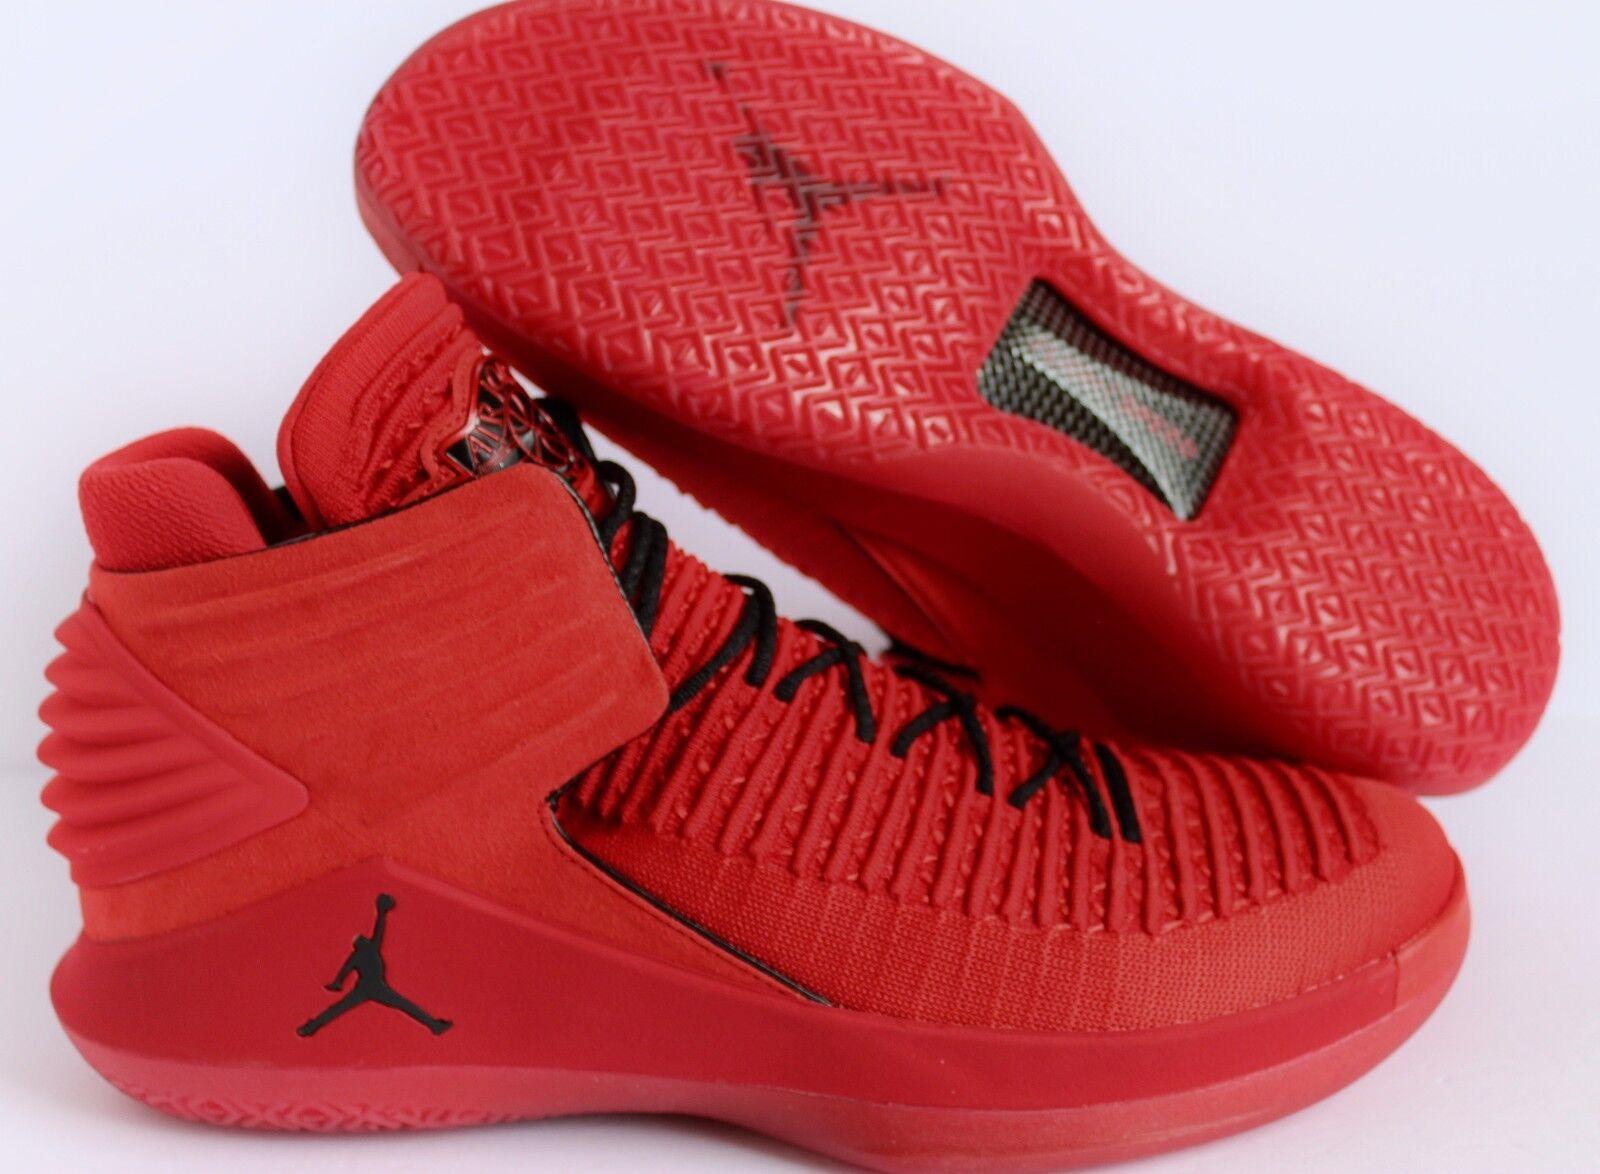 Nike Air Rosso Jordan XXXII Sz 9 Rosso Air Corsa Universidad Rojo Negro [AA20183601] f2c717